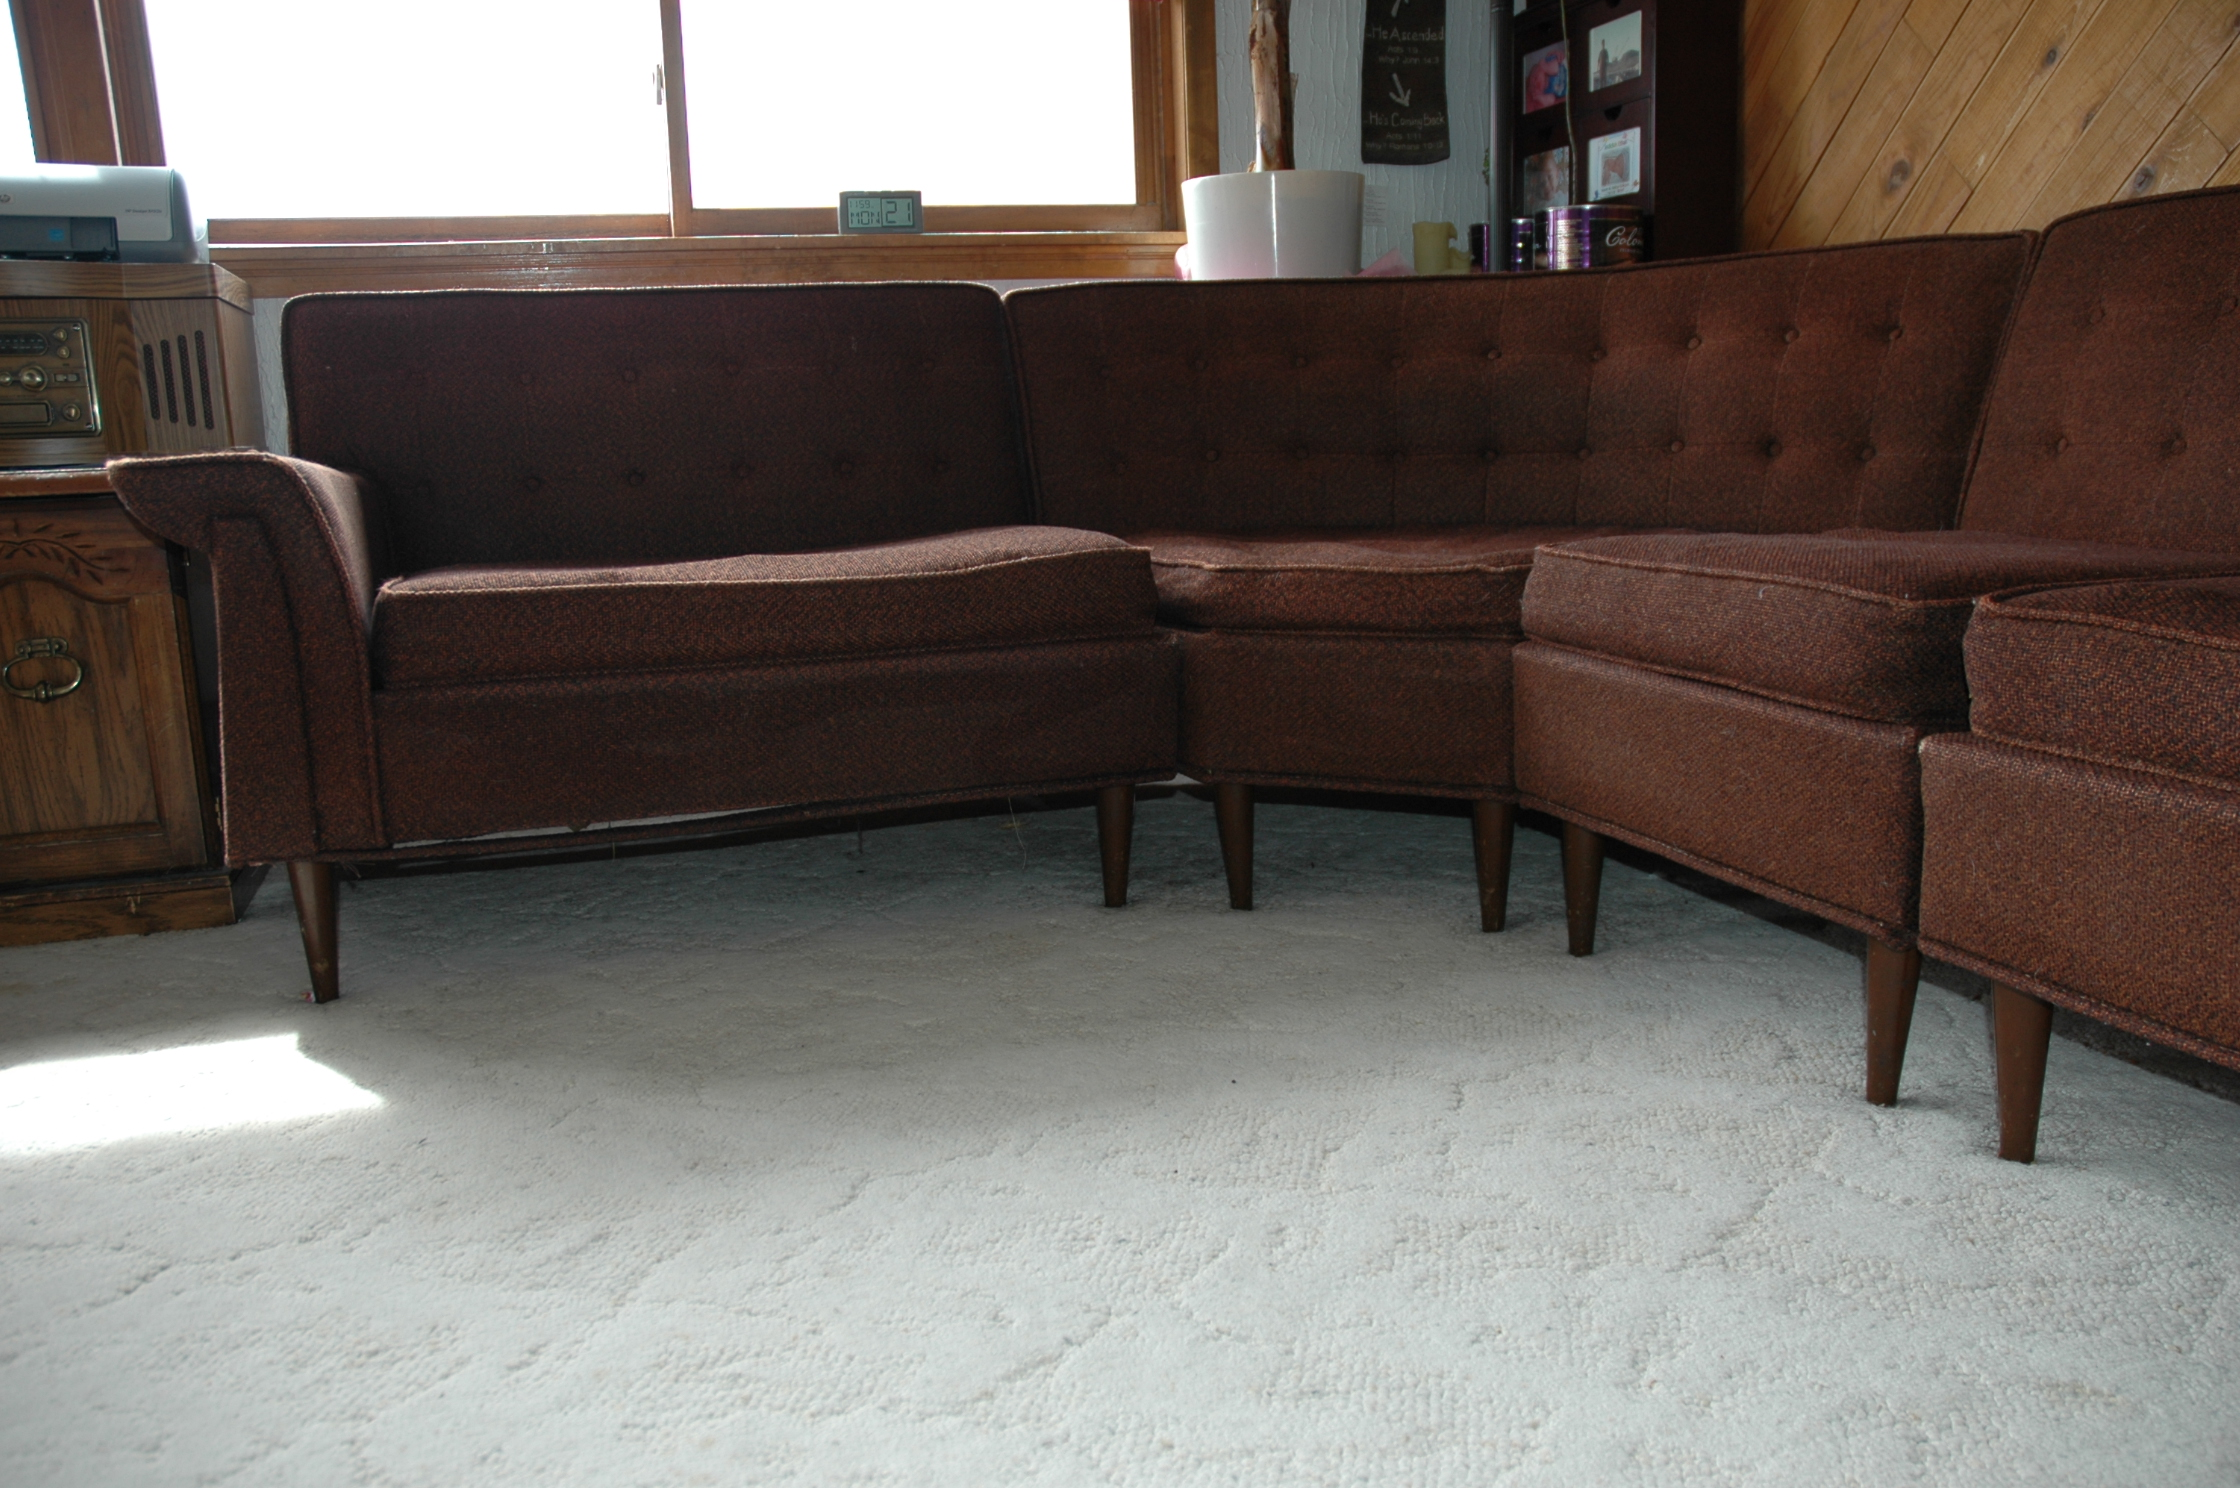 Kroehler Furniture To Change Image Kroehler Midcentury